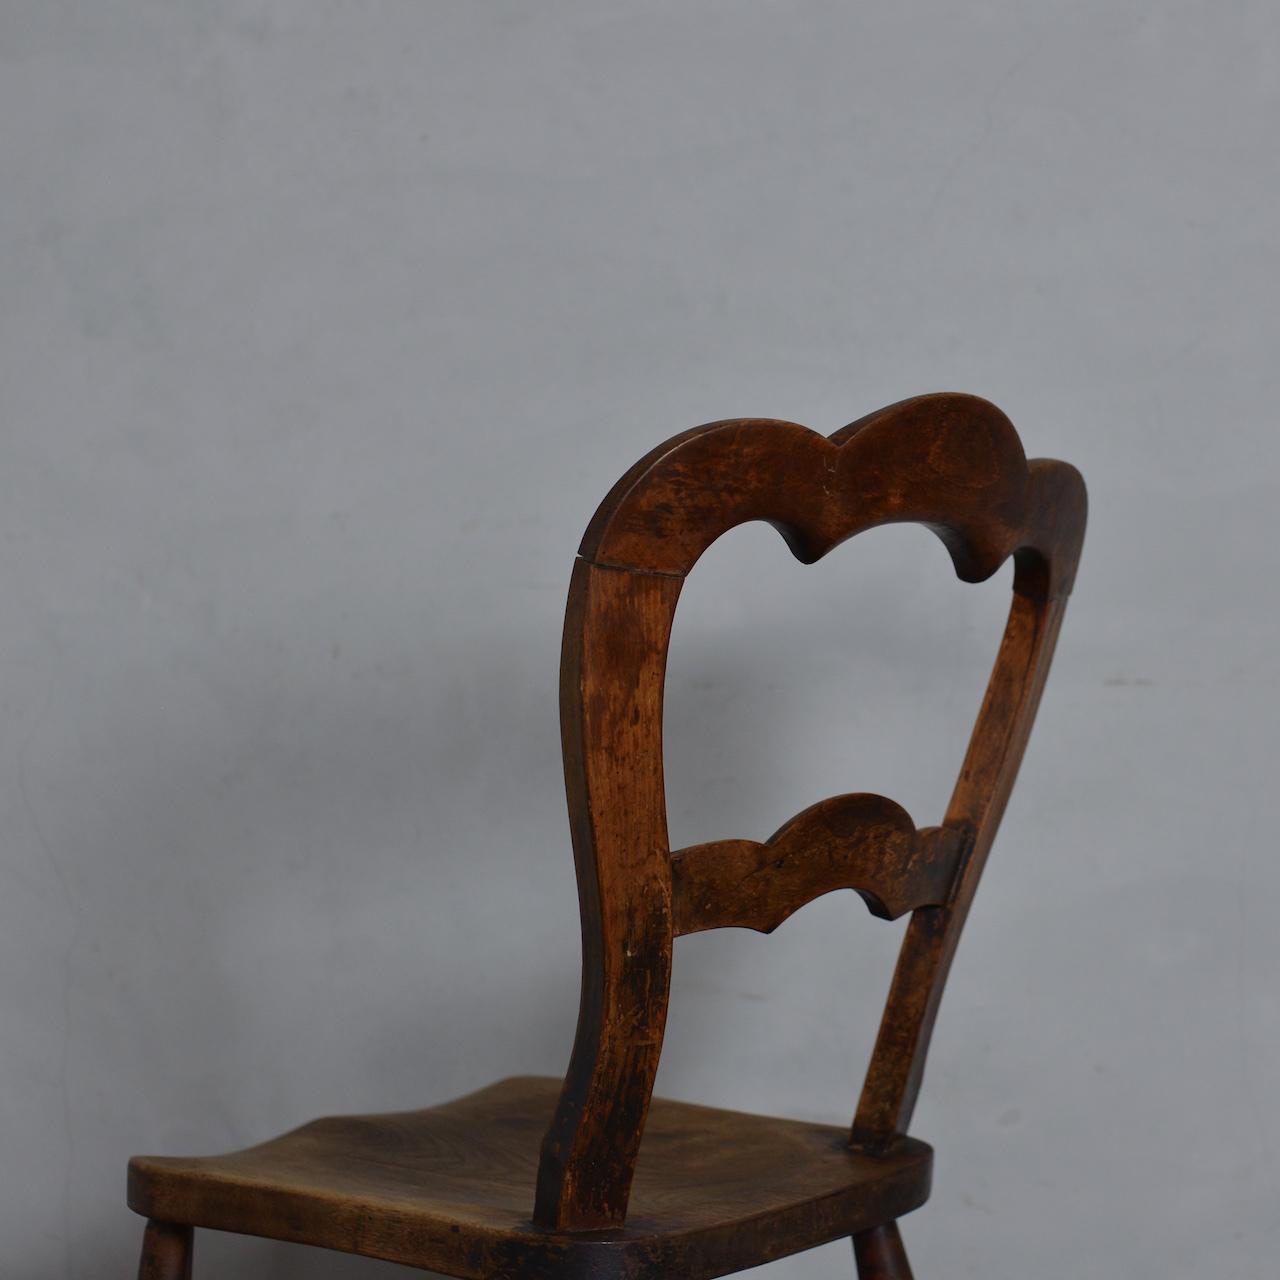 Balloon Back Kitchen Chair / バルーン バック キッチン チェア 【B】〈ダイニング チェア・椅子・カントリー〉